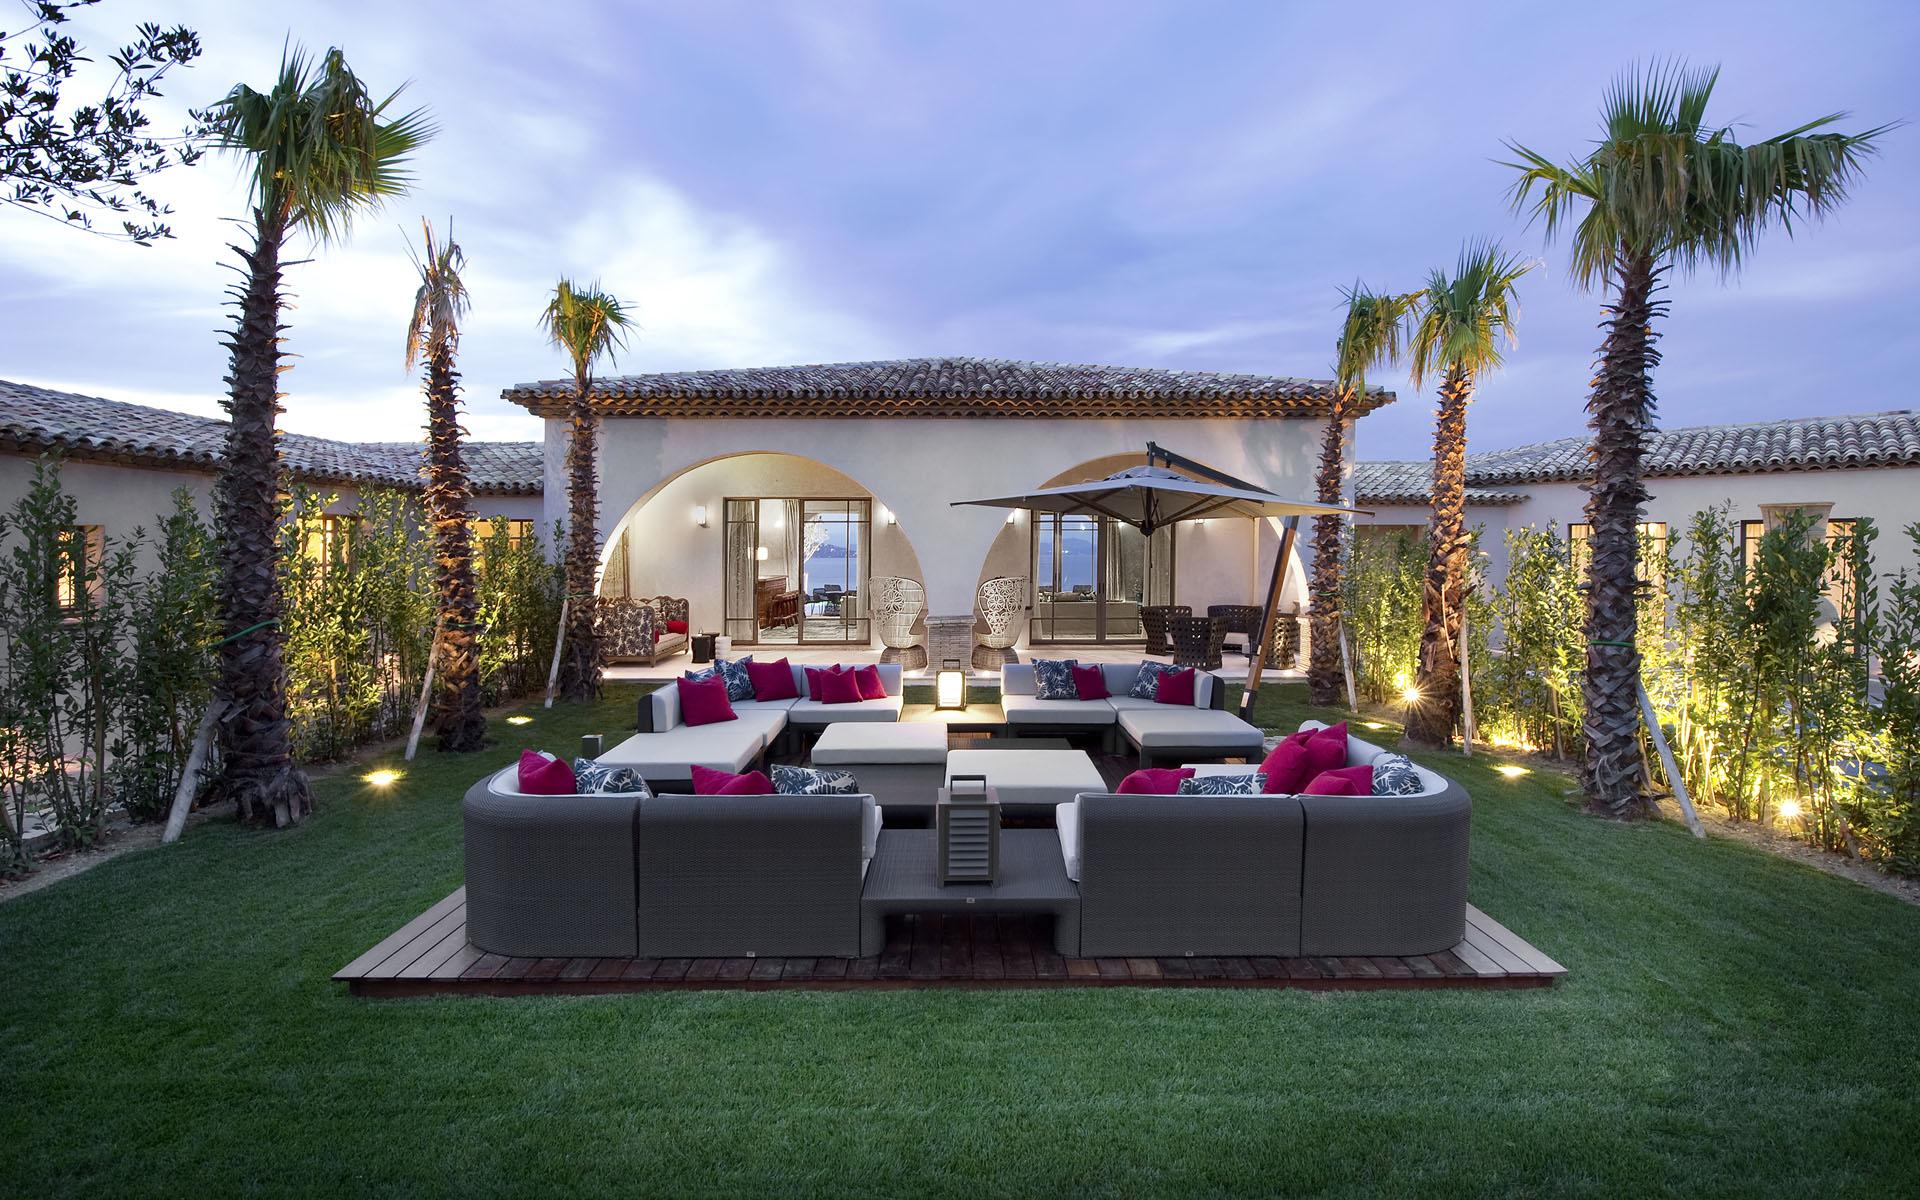 35 Modern Villa Design That Will Amaze You - The WoW Style on Luxury Backyard Design  id=94578